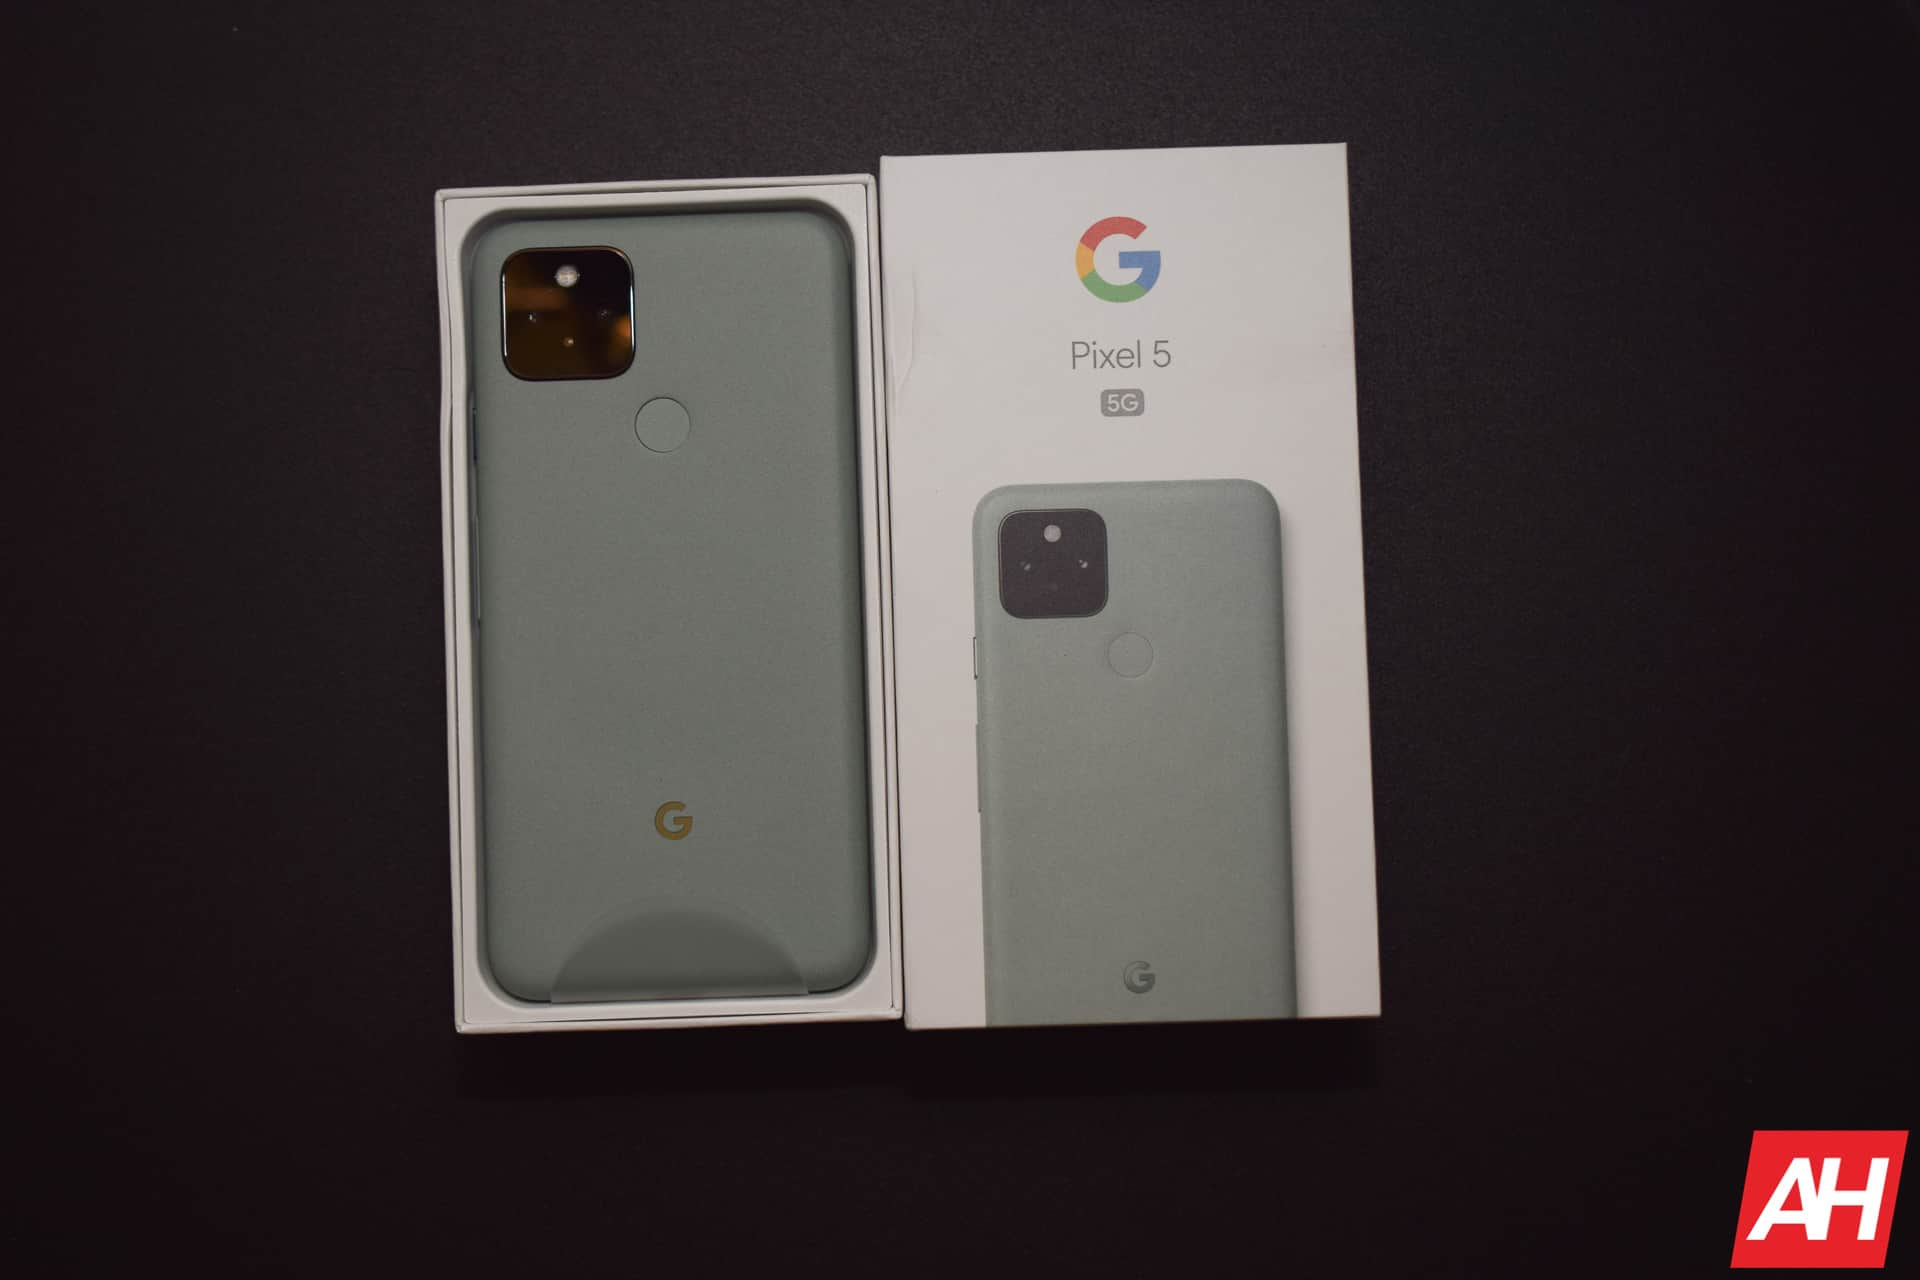 Google Pixel 5 AM AH 1